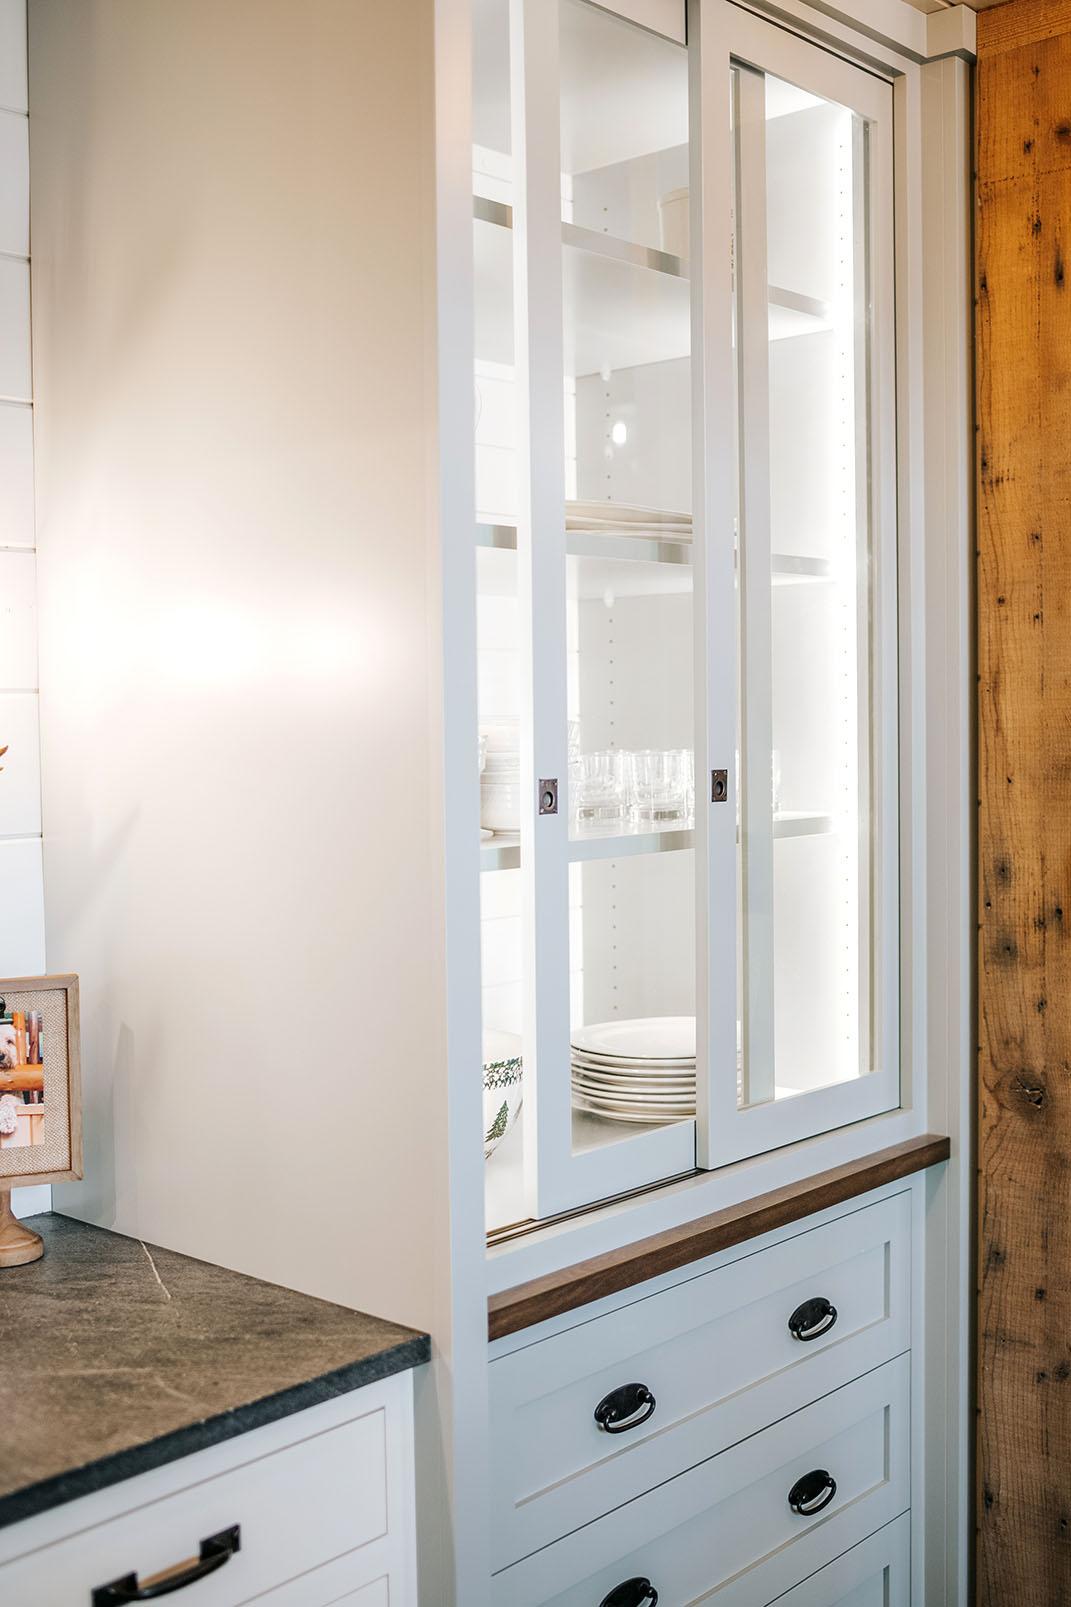 Sliding Glass Door Hutch Painted Oyster With Inset Doors Below